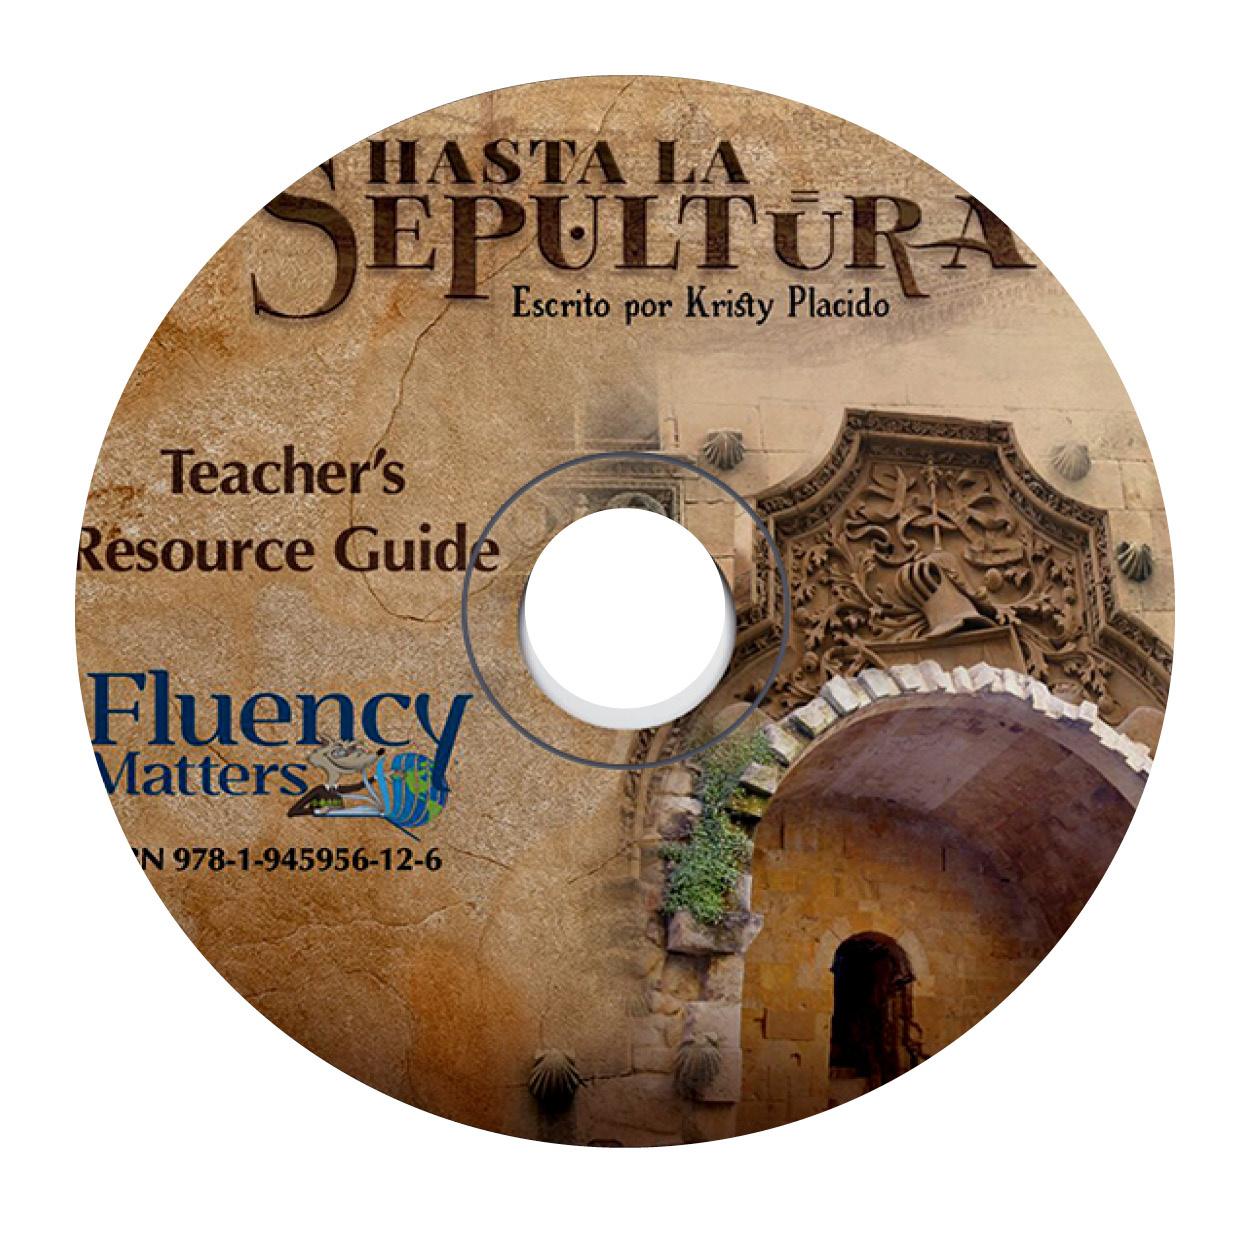 Hasta la sepultura - Teacher's Guide